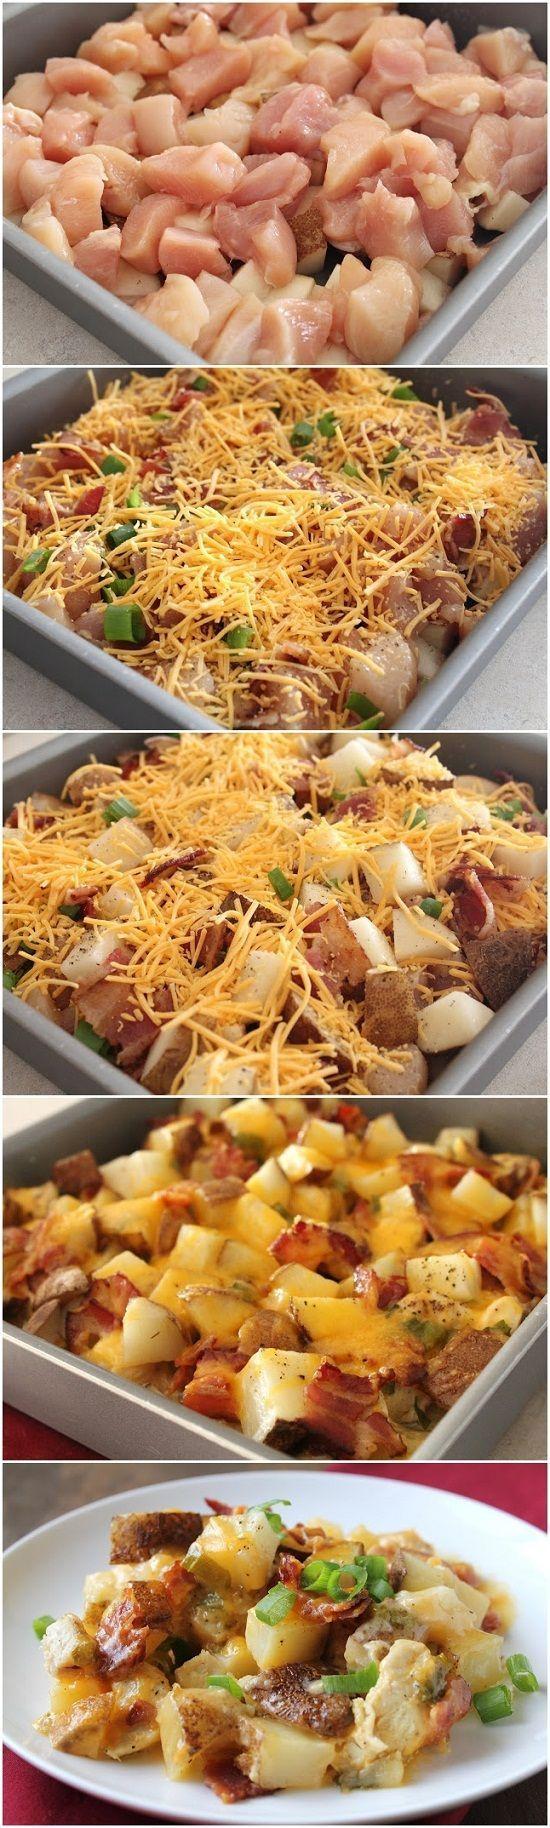 Loaded Baked Potato & Chicken Casserole Recipe  – Food.com